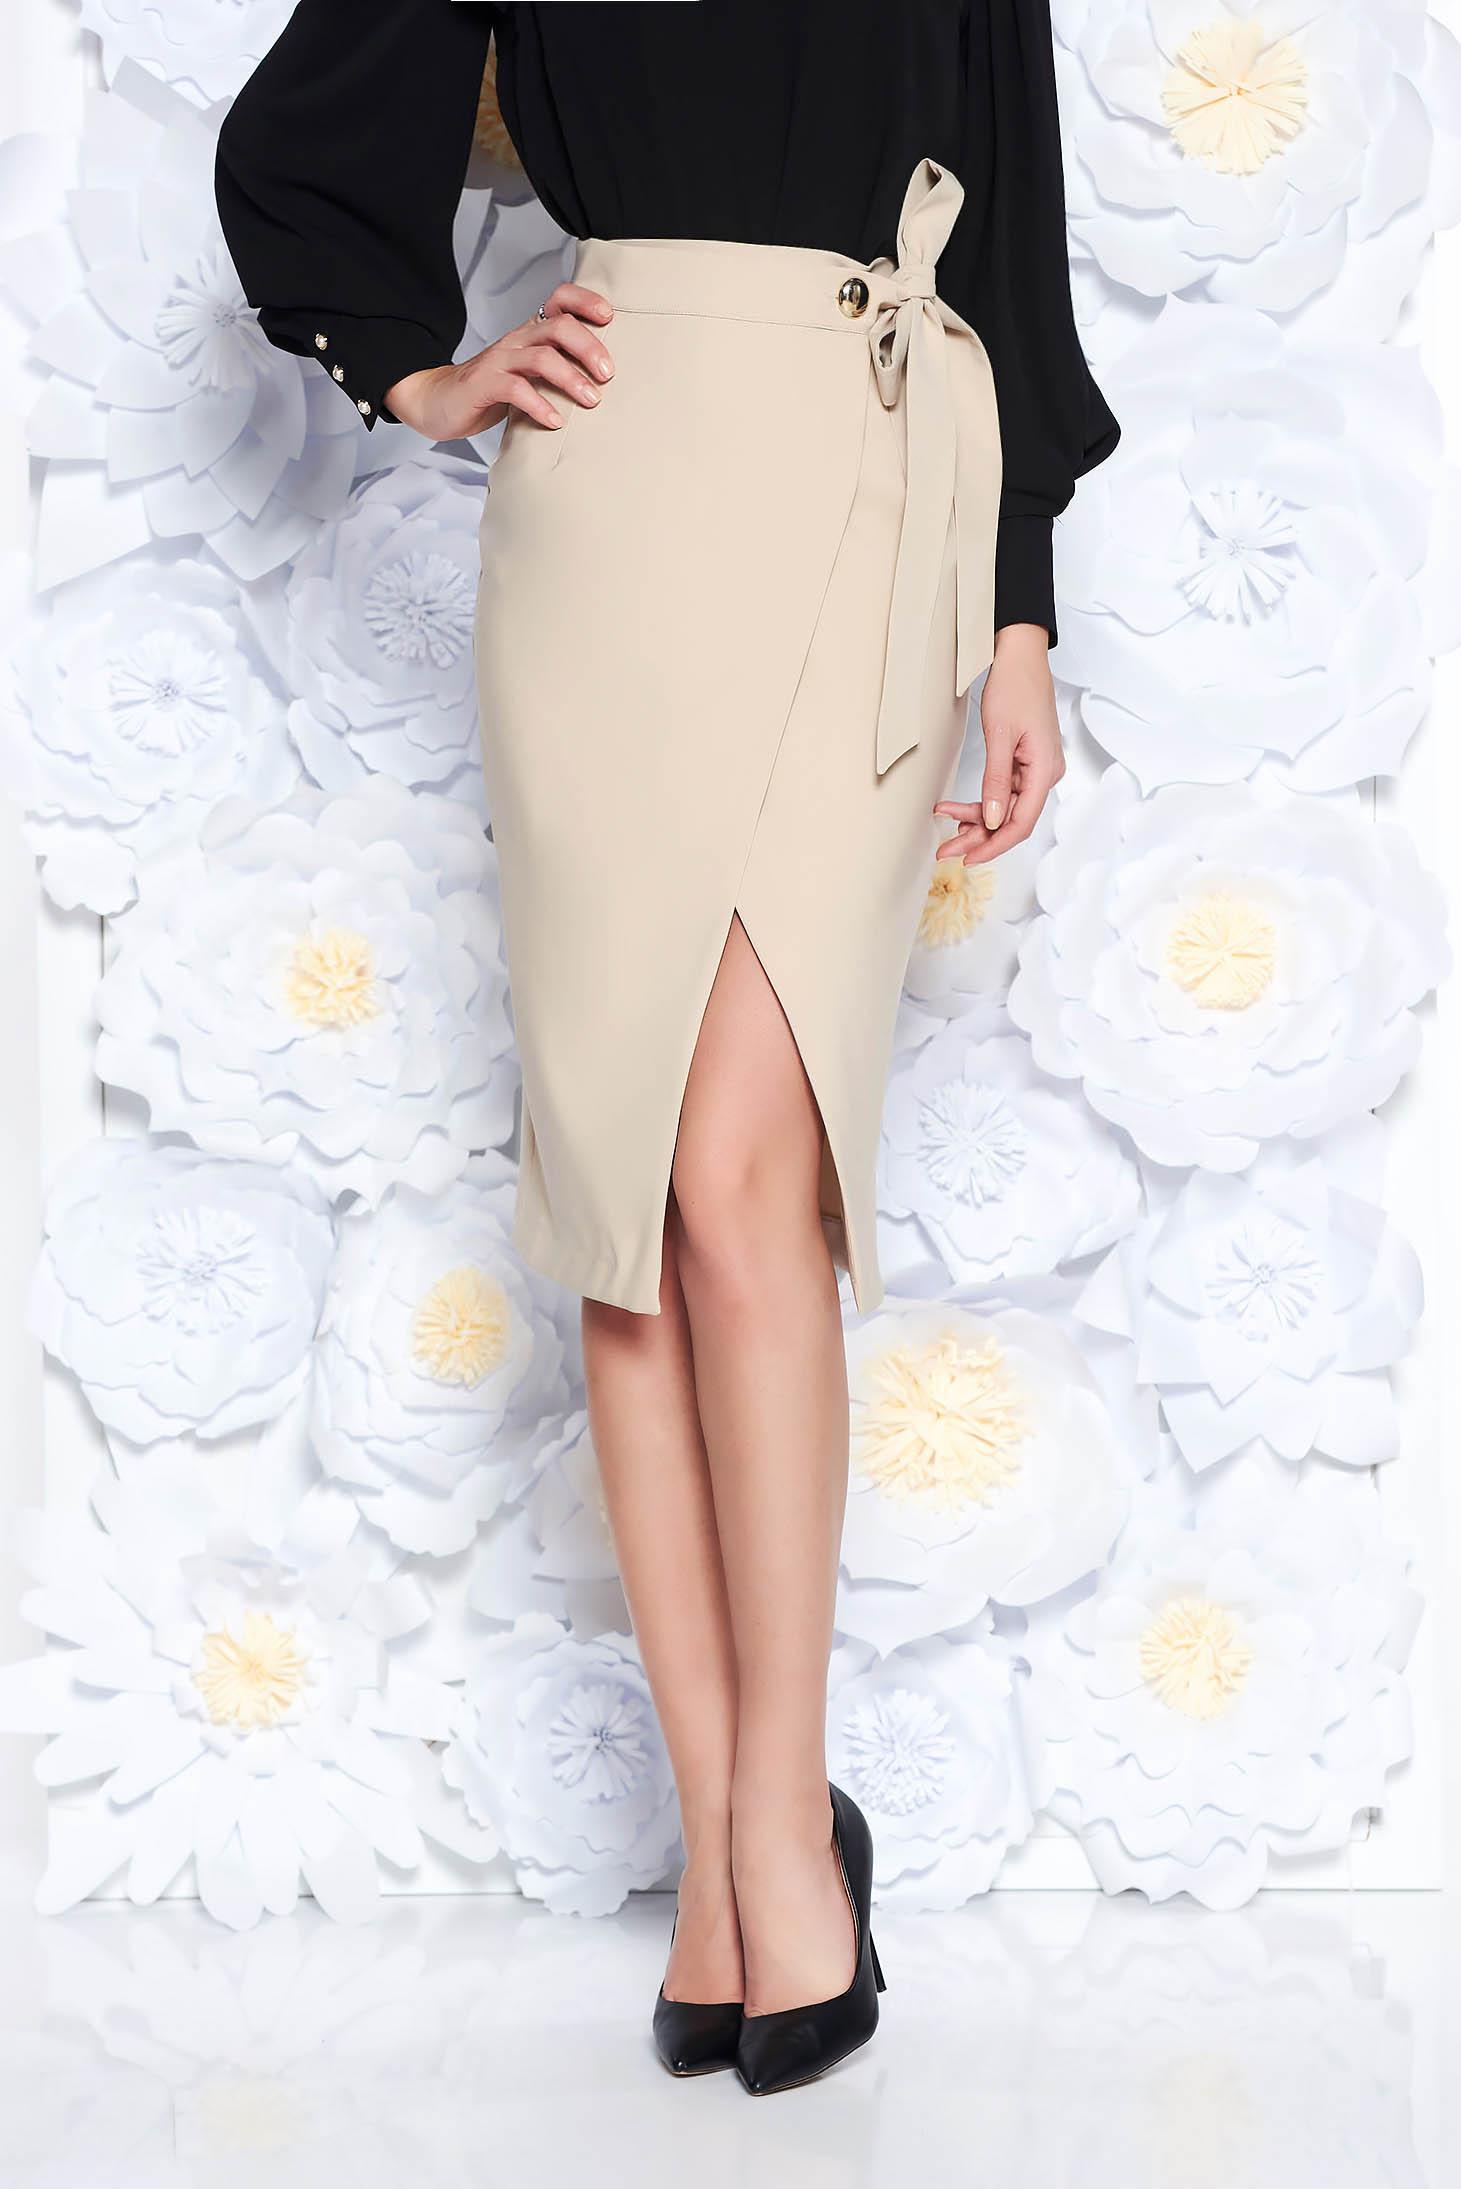 PrettyGirl cream office high waisted pencil skirt slightly elastic fabric wrap around accessorized with tied waistband